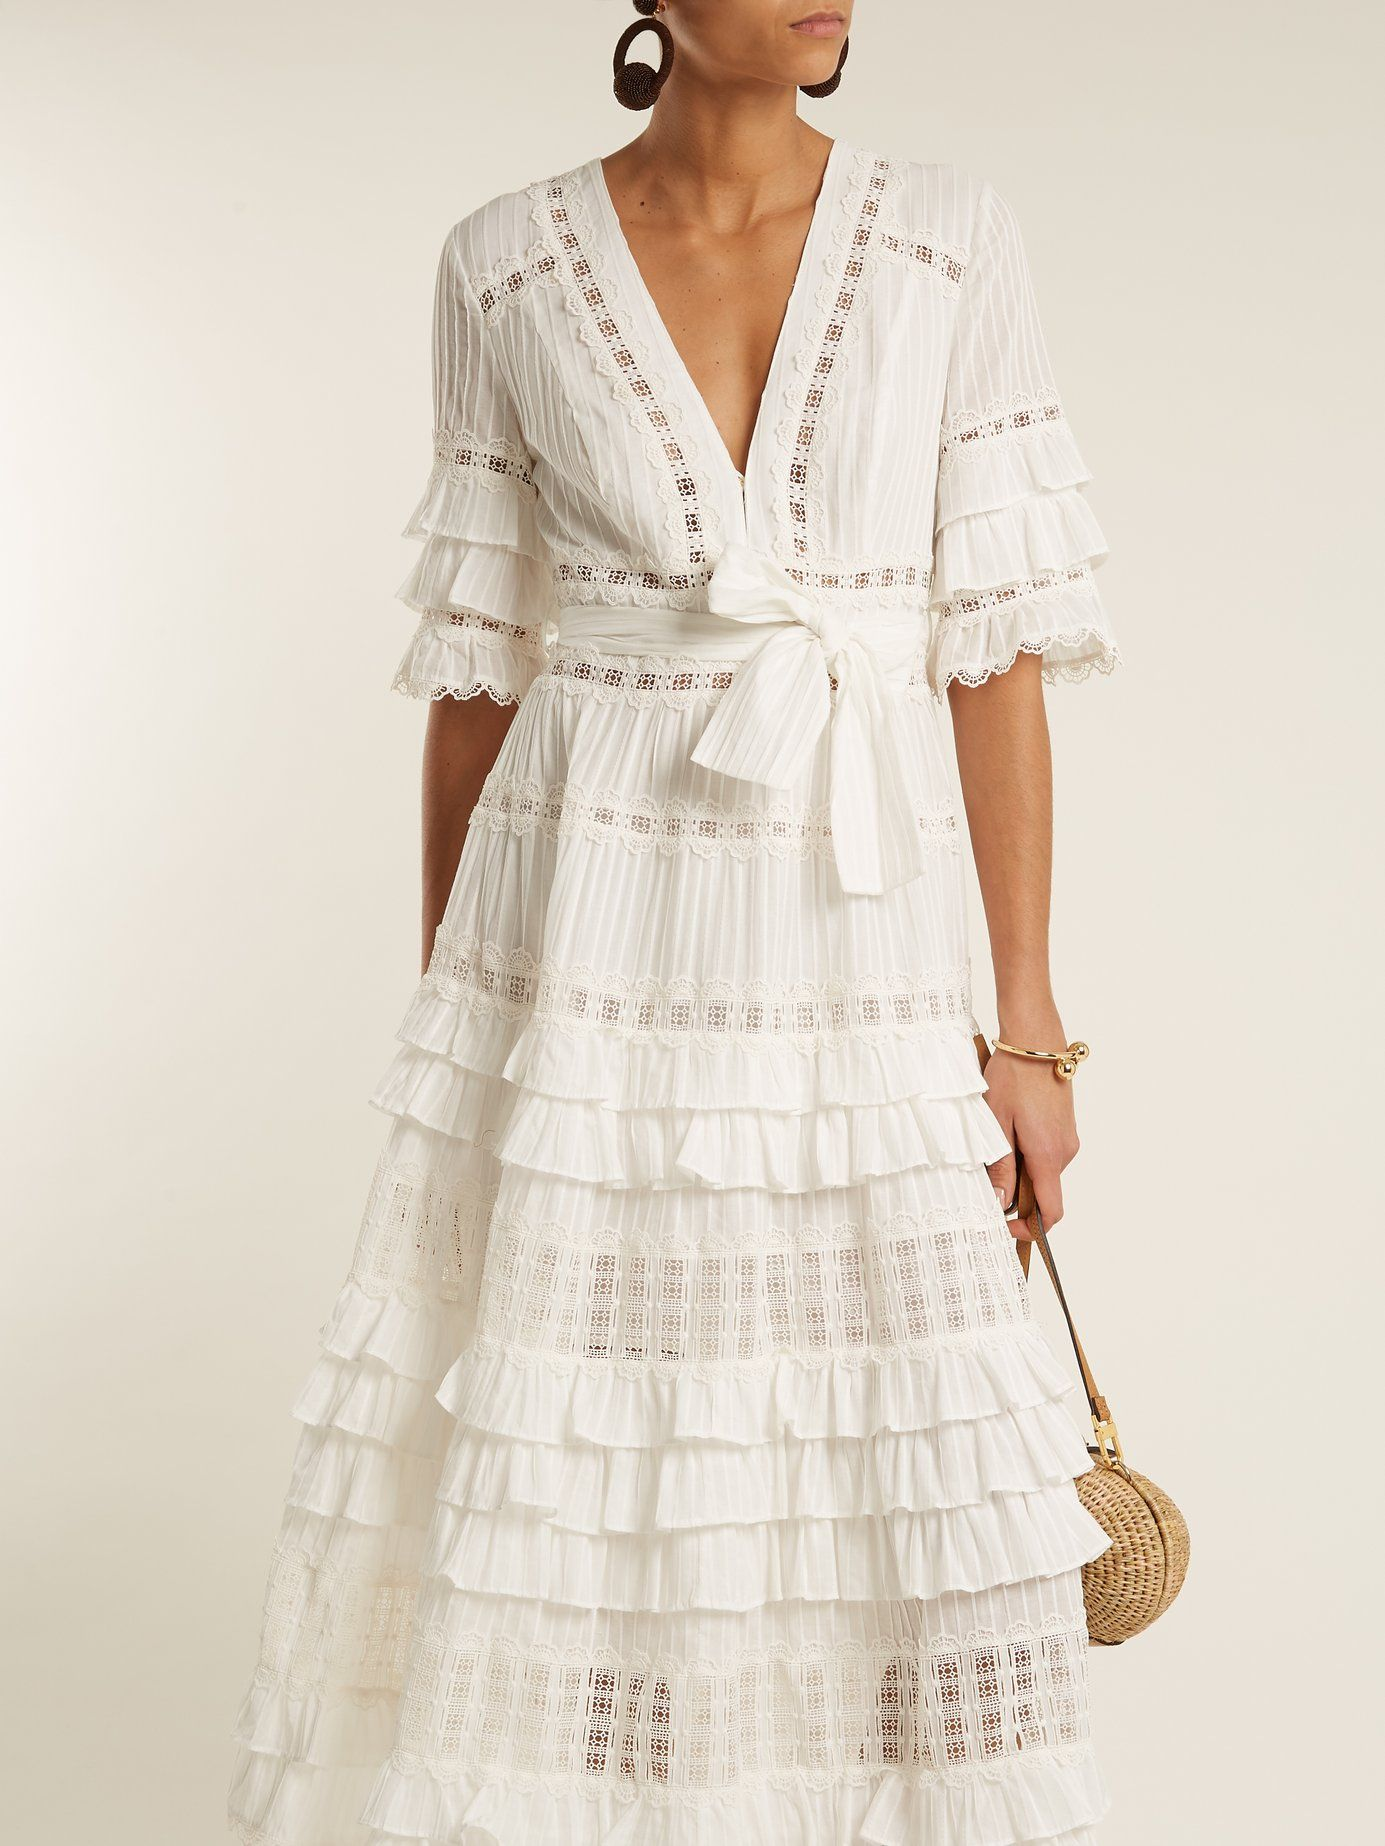 Click Here To Buy Zimmermann Corsail Lace Insert Cotton Dress At Matchesfashion Com Fashion Dresses Boho Dress [ 1846 x 1385 Pixel ]